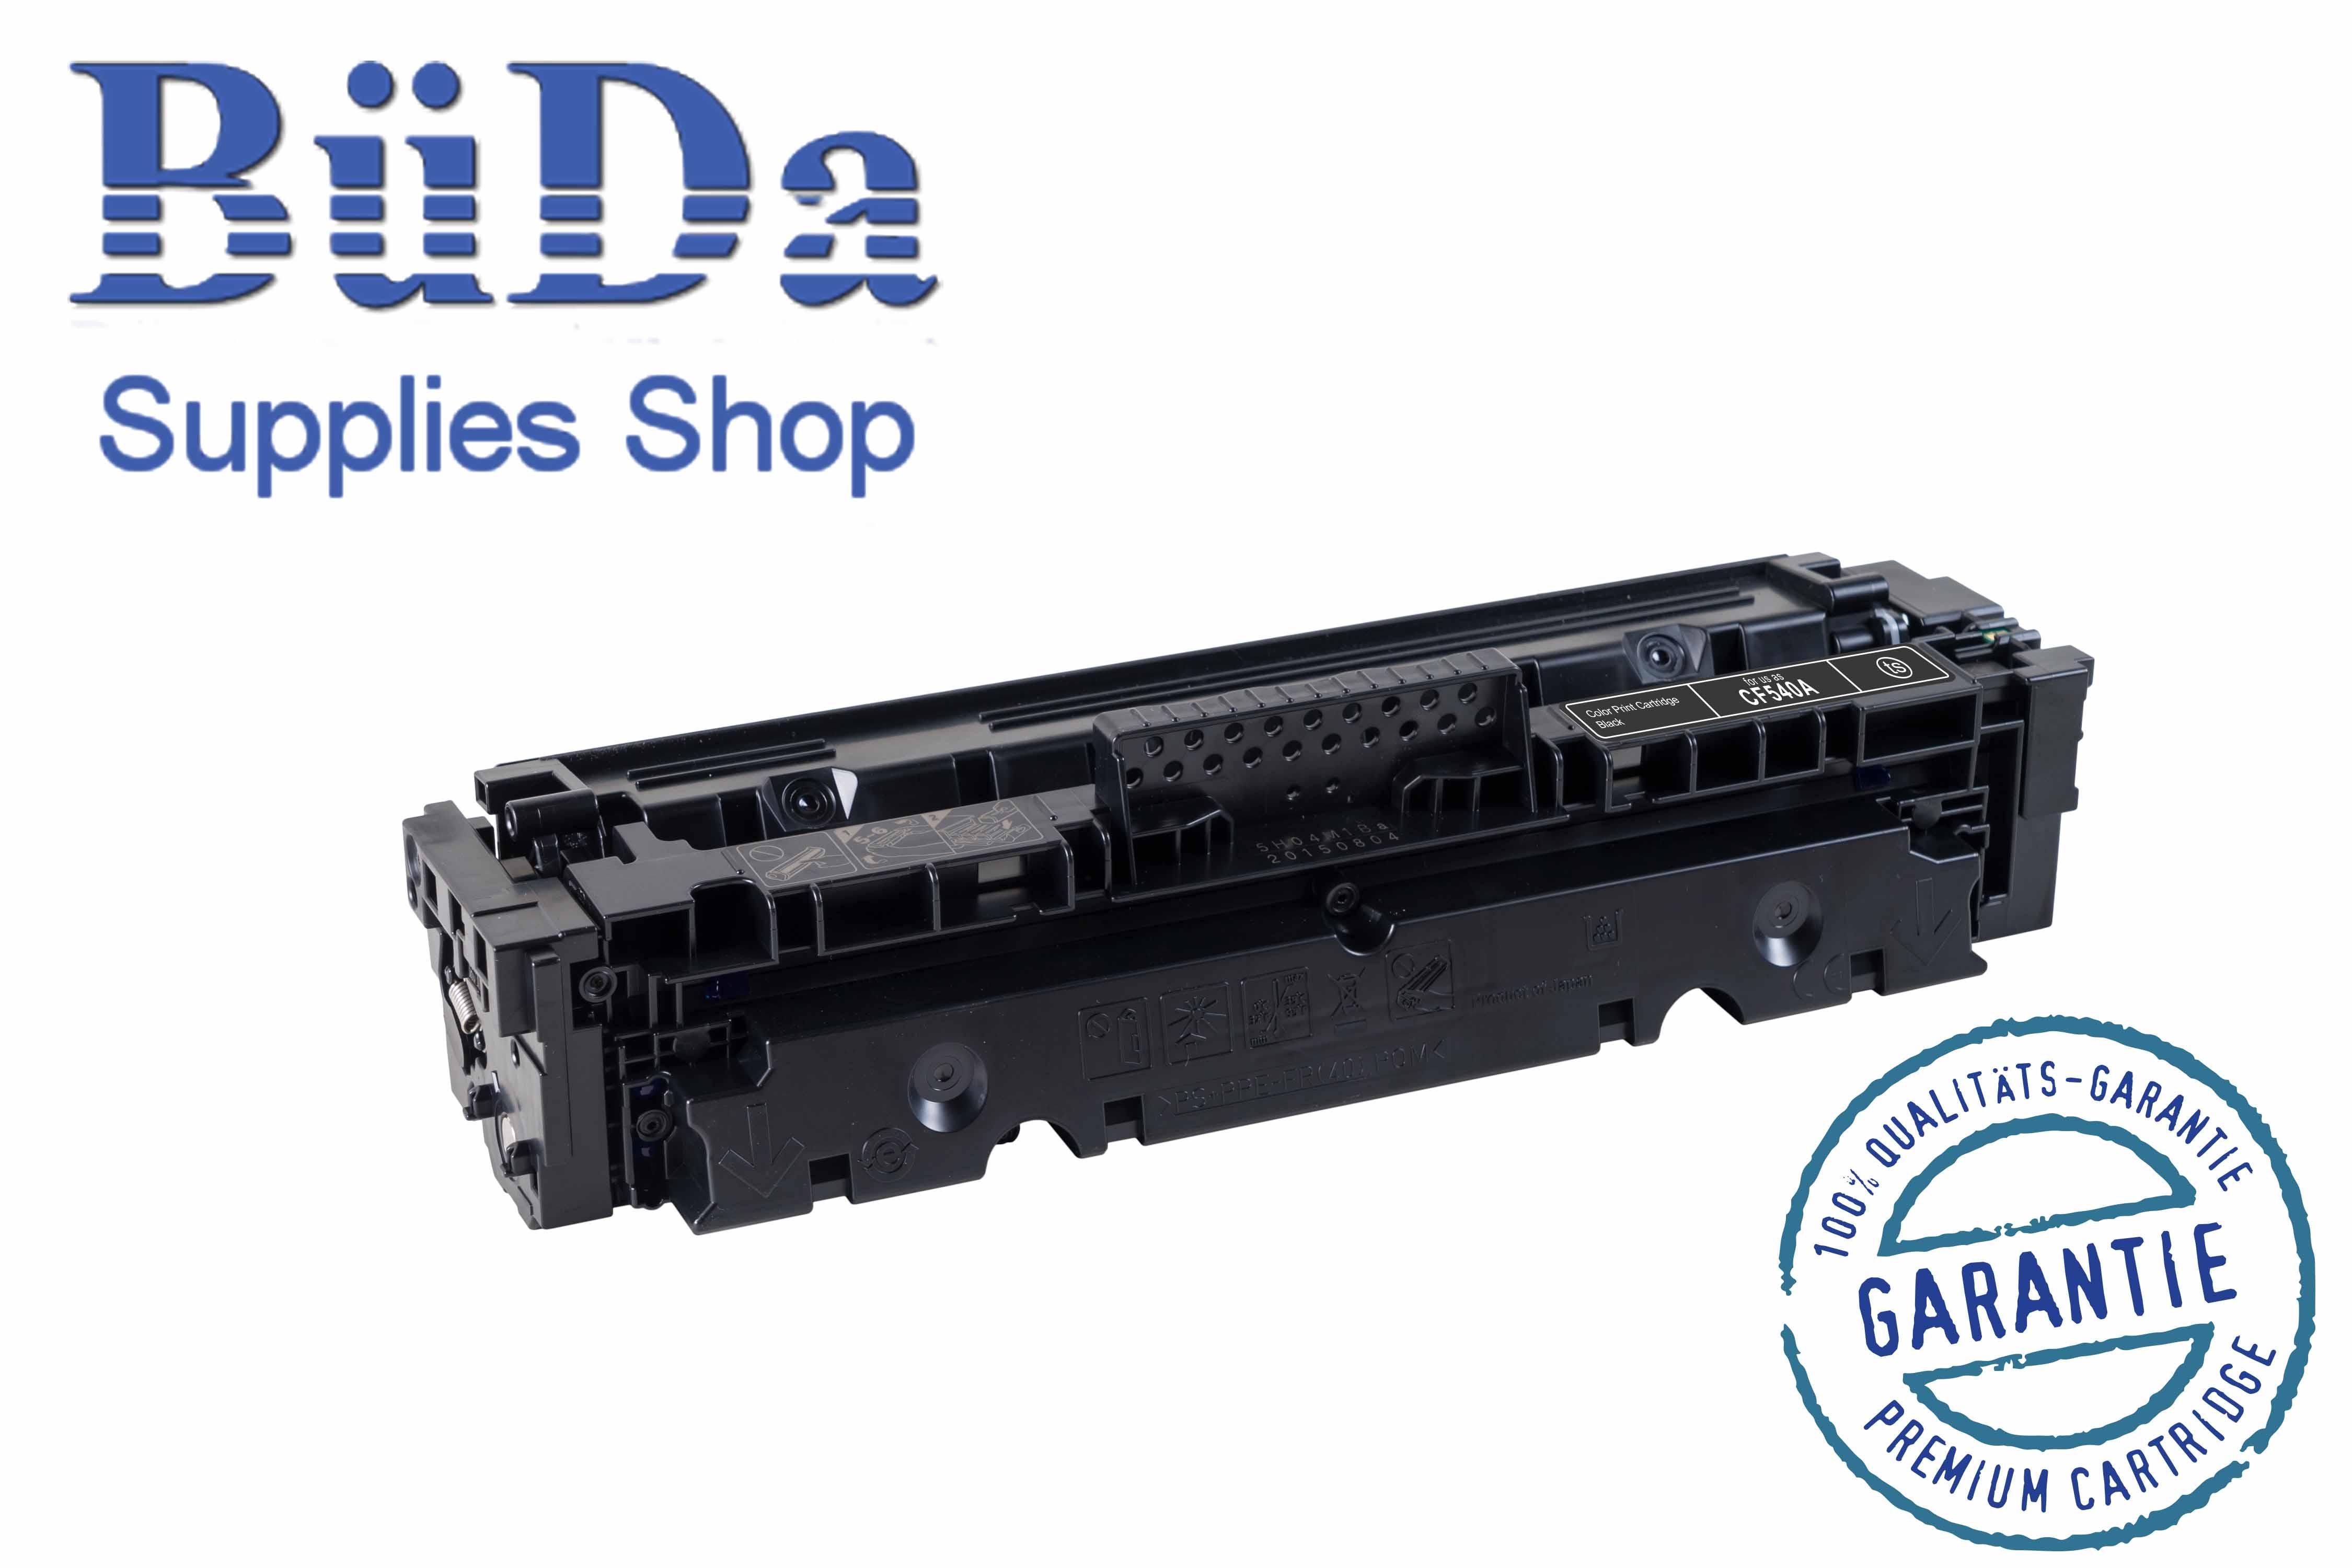 Toner-Modul komp. zu CF540A / 203A black 1400 Seiten